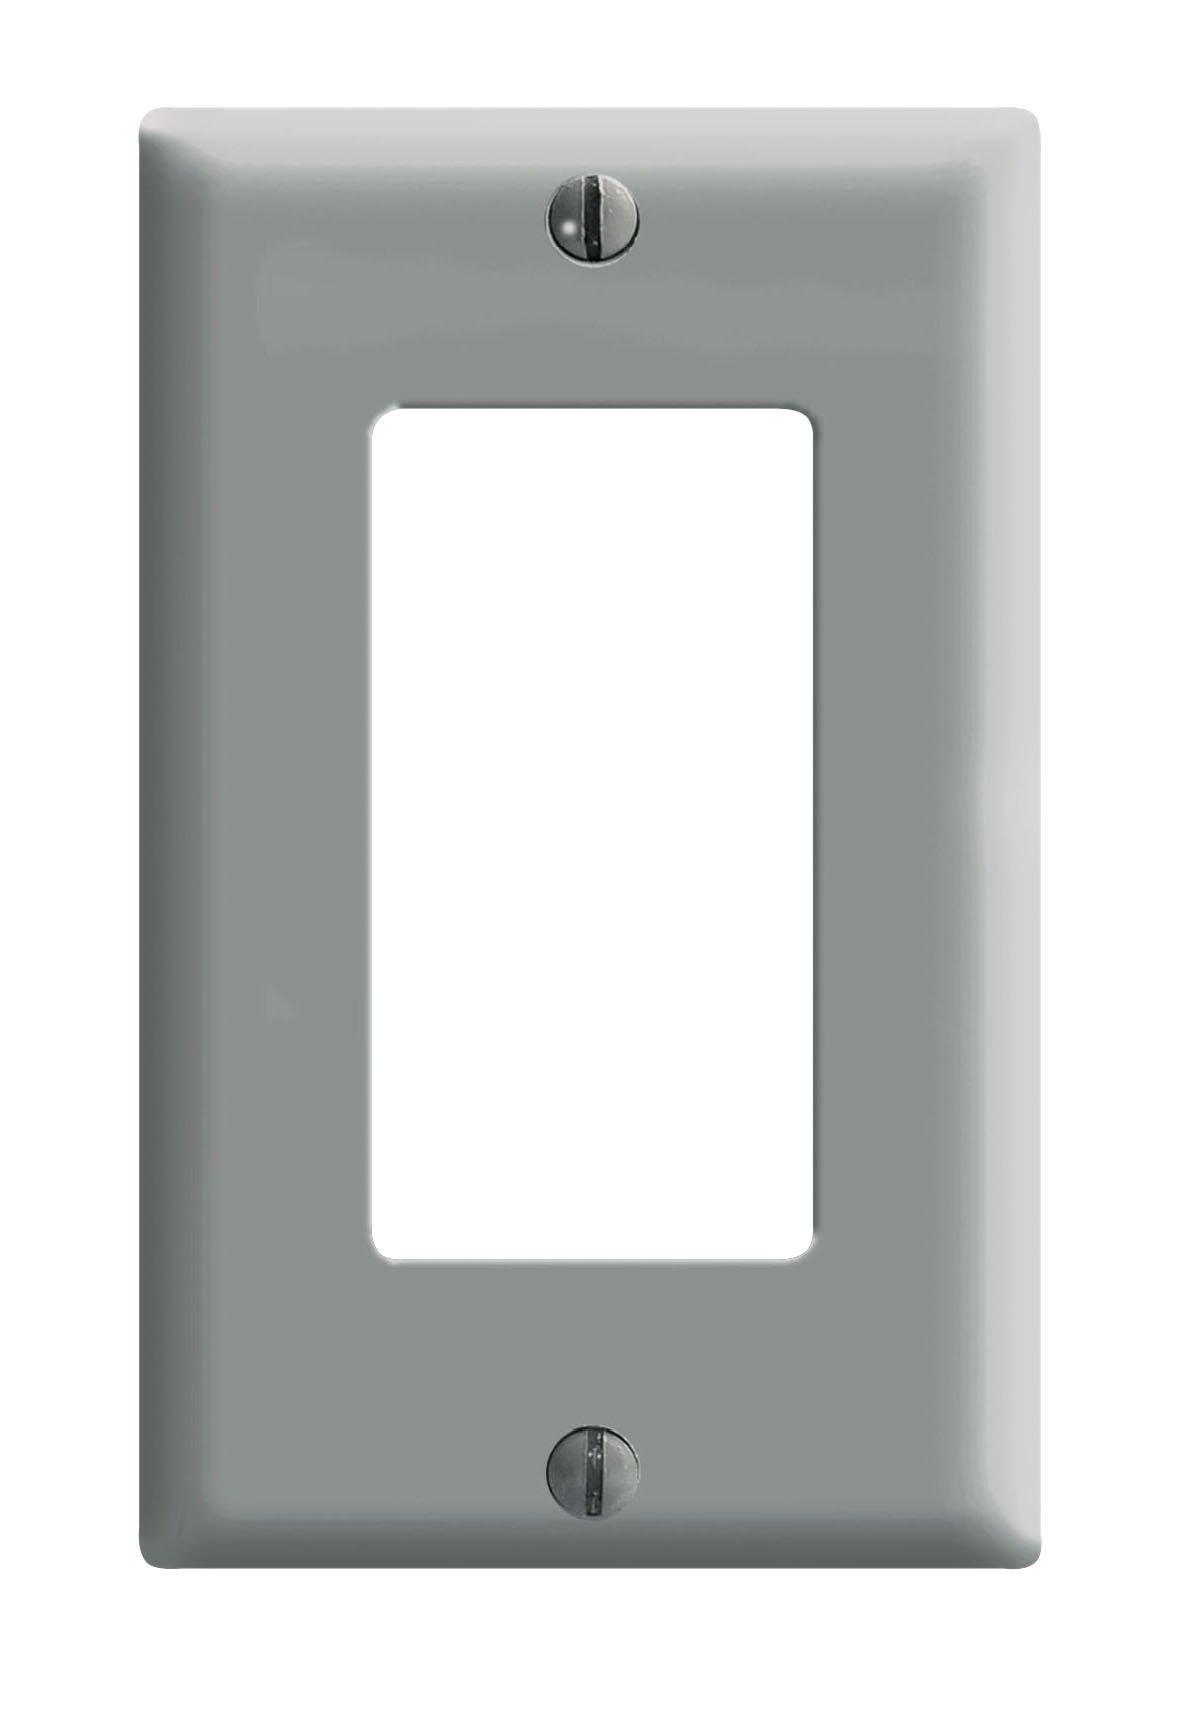 Leviton 80401-GY 1-Gang Decora/GFCI Device Decora Wallplate, Standard Size, Thermoset, Device Mount, 25-Pack, Gray